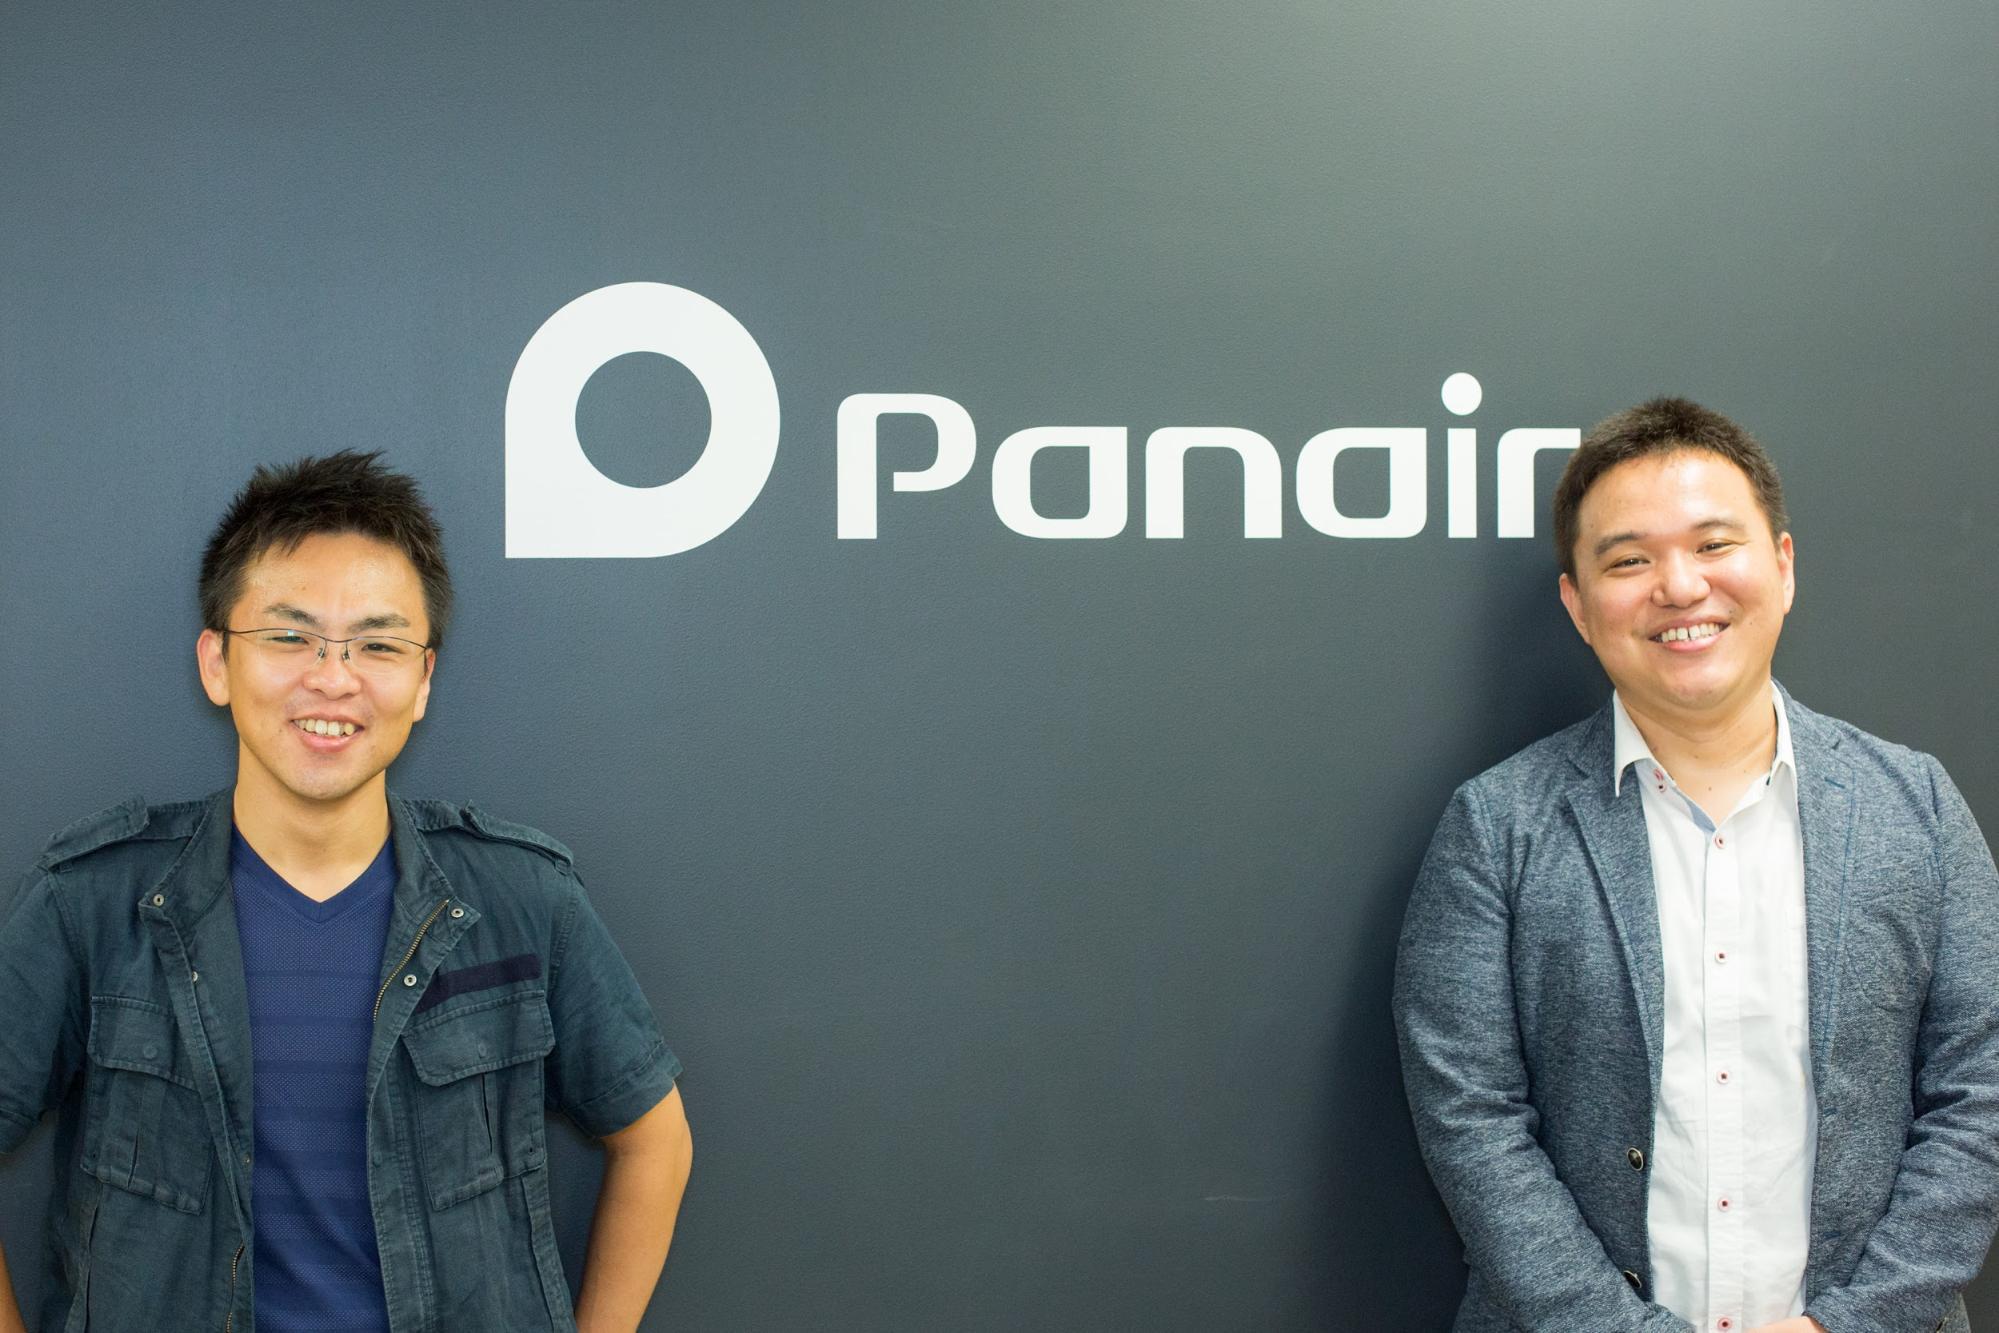 Rubyで開発した基幹システム「Panair Cloud」が新しい電力サービスを作る|株式会社パネイル【第1回】